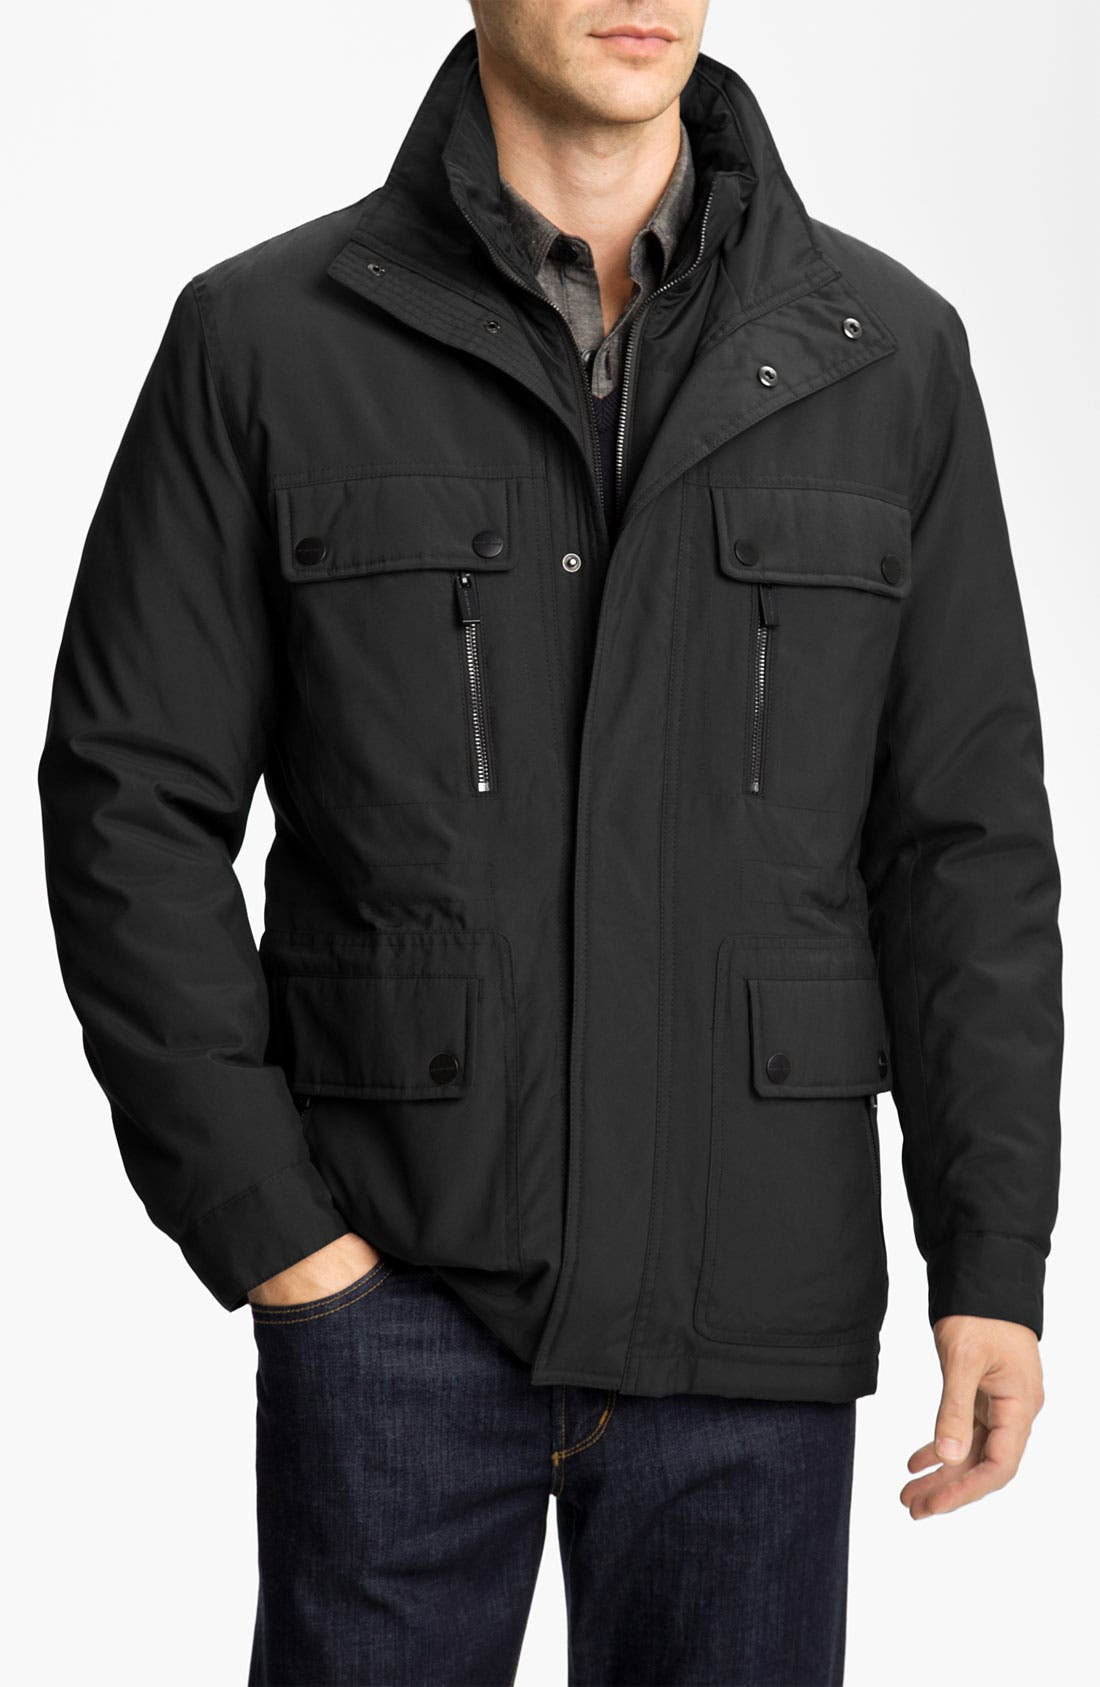 Alternate Image 1 Selected - Michael Kors 'Colfax' Jacket